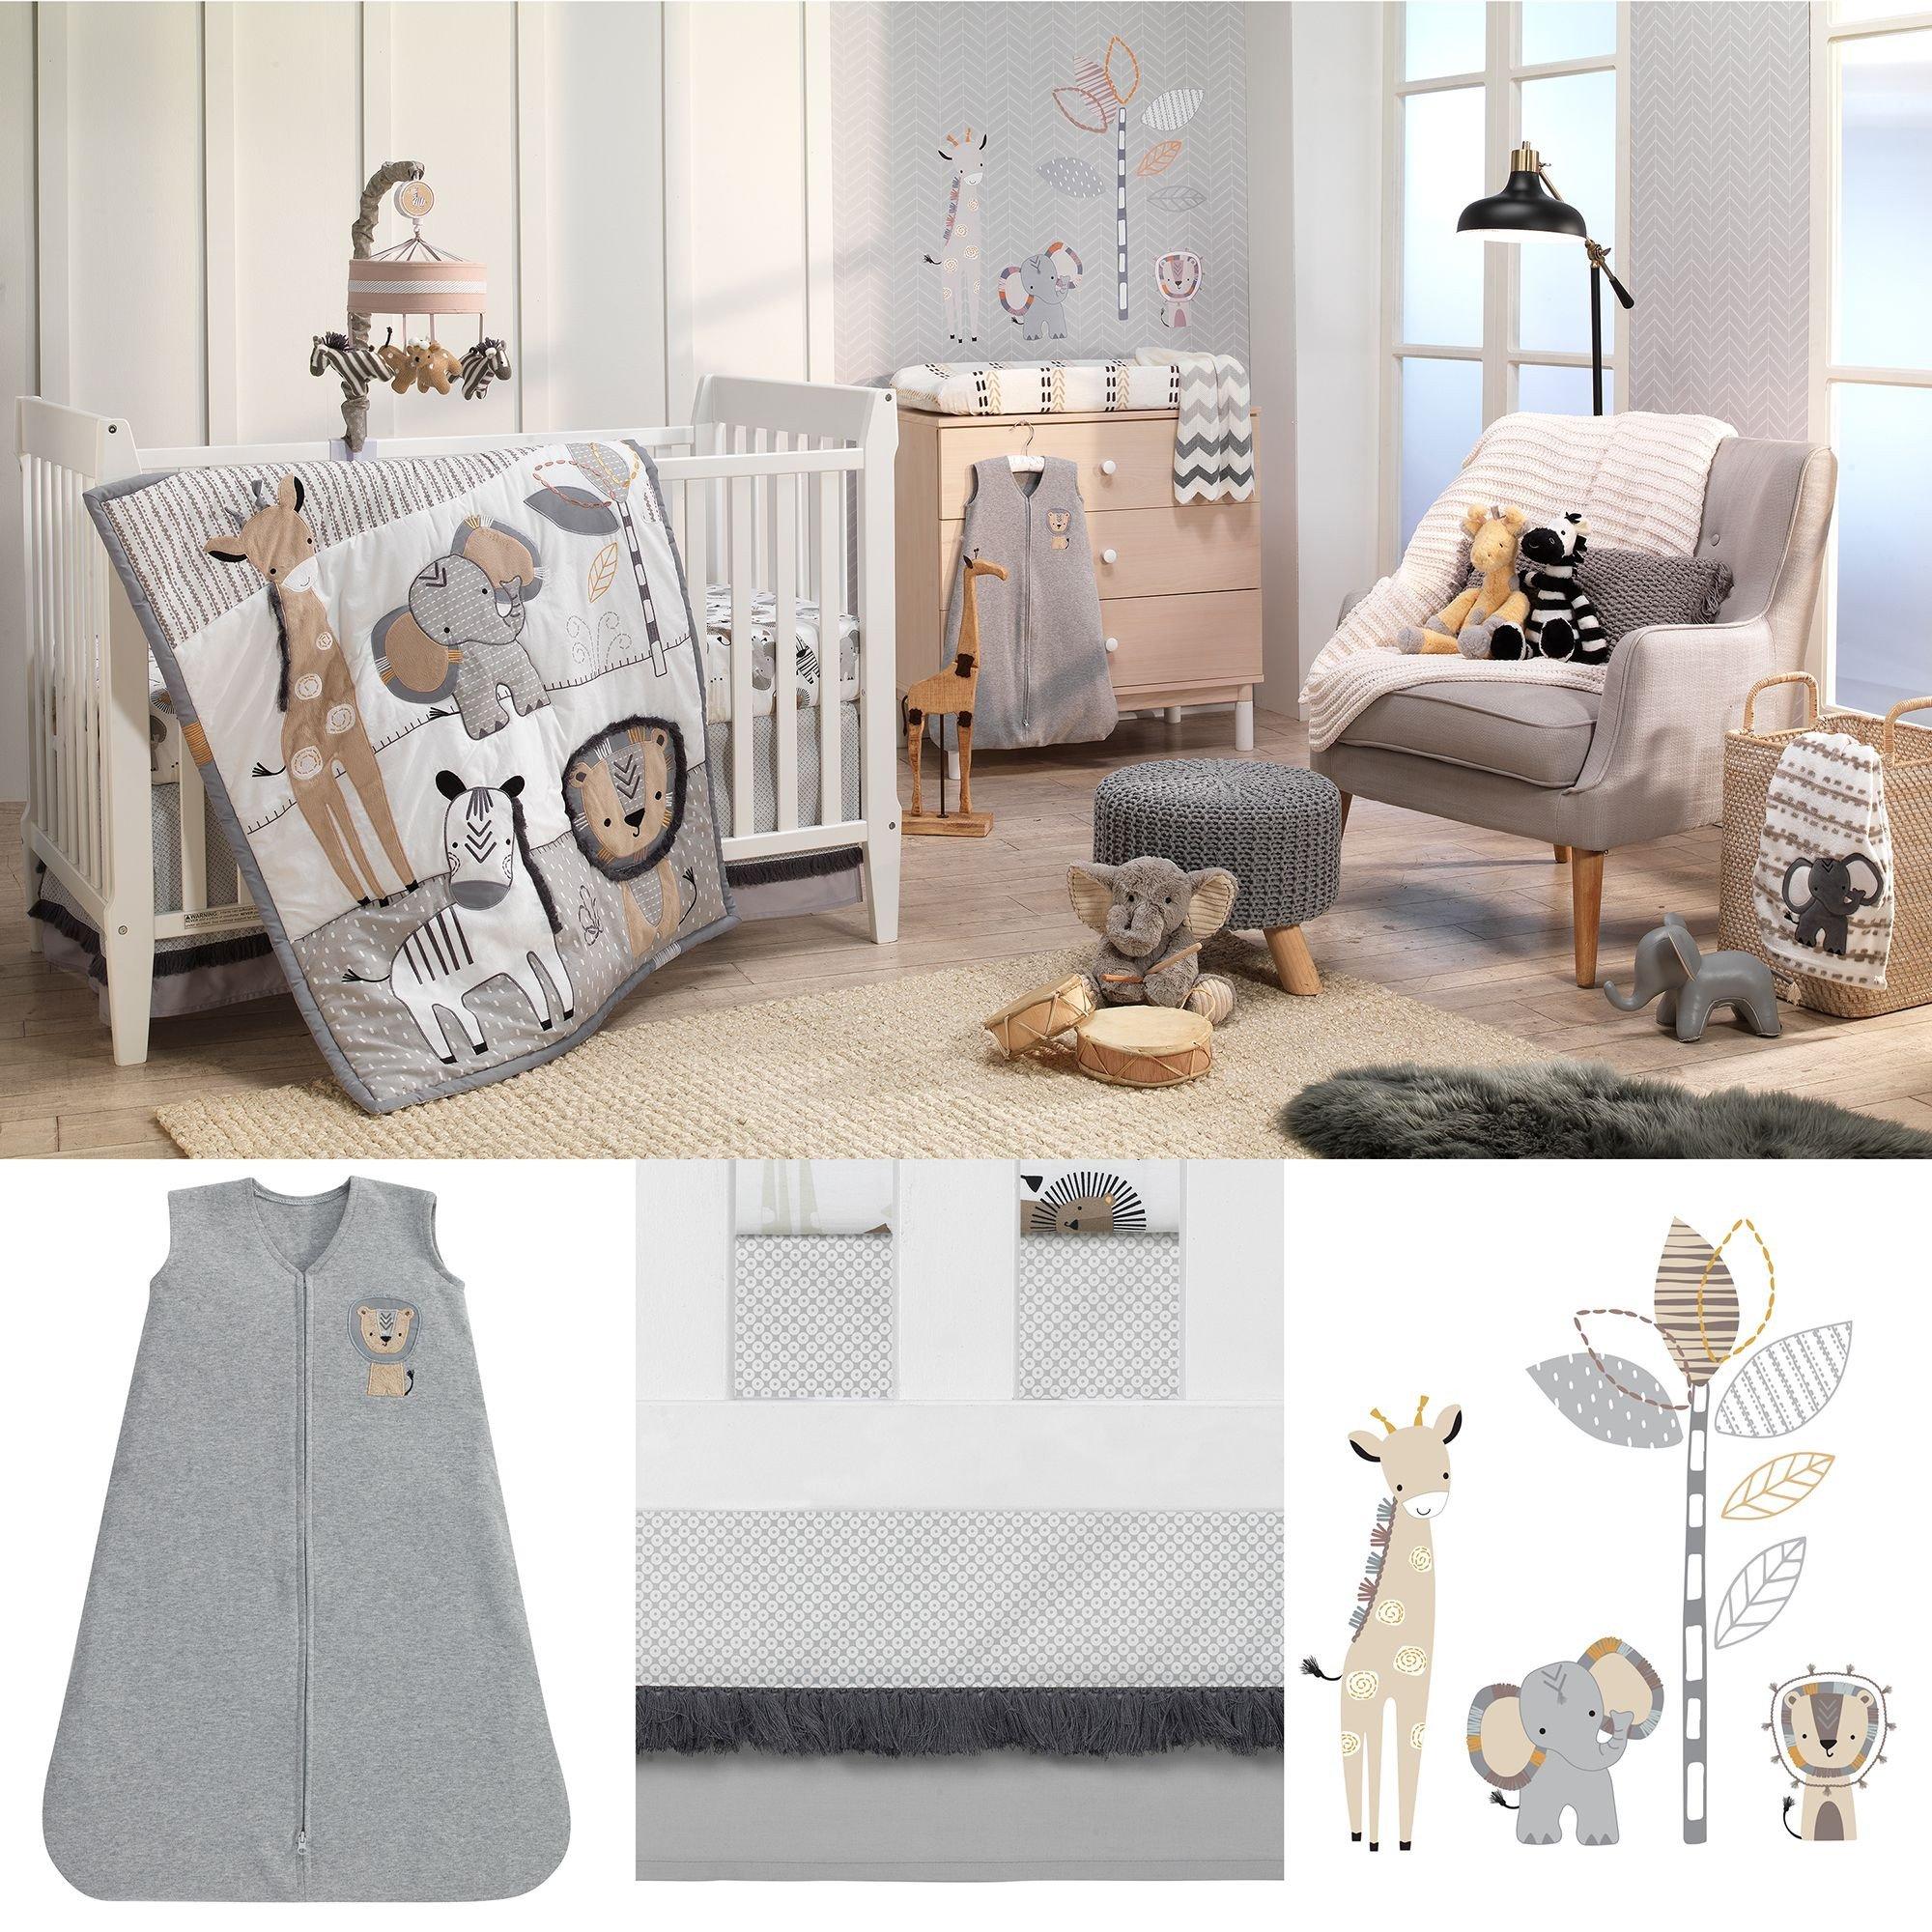 Baby Boy Bedroom Set Fresh Jungle Safari Gray Tan White Nursery 6 Piece Baby Crib